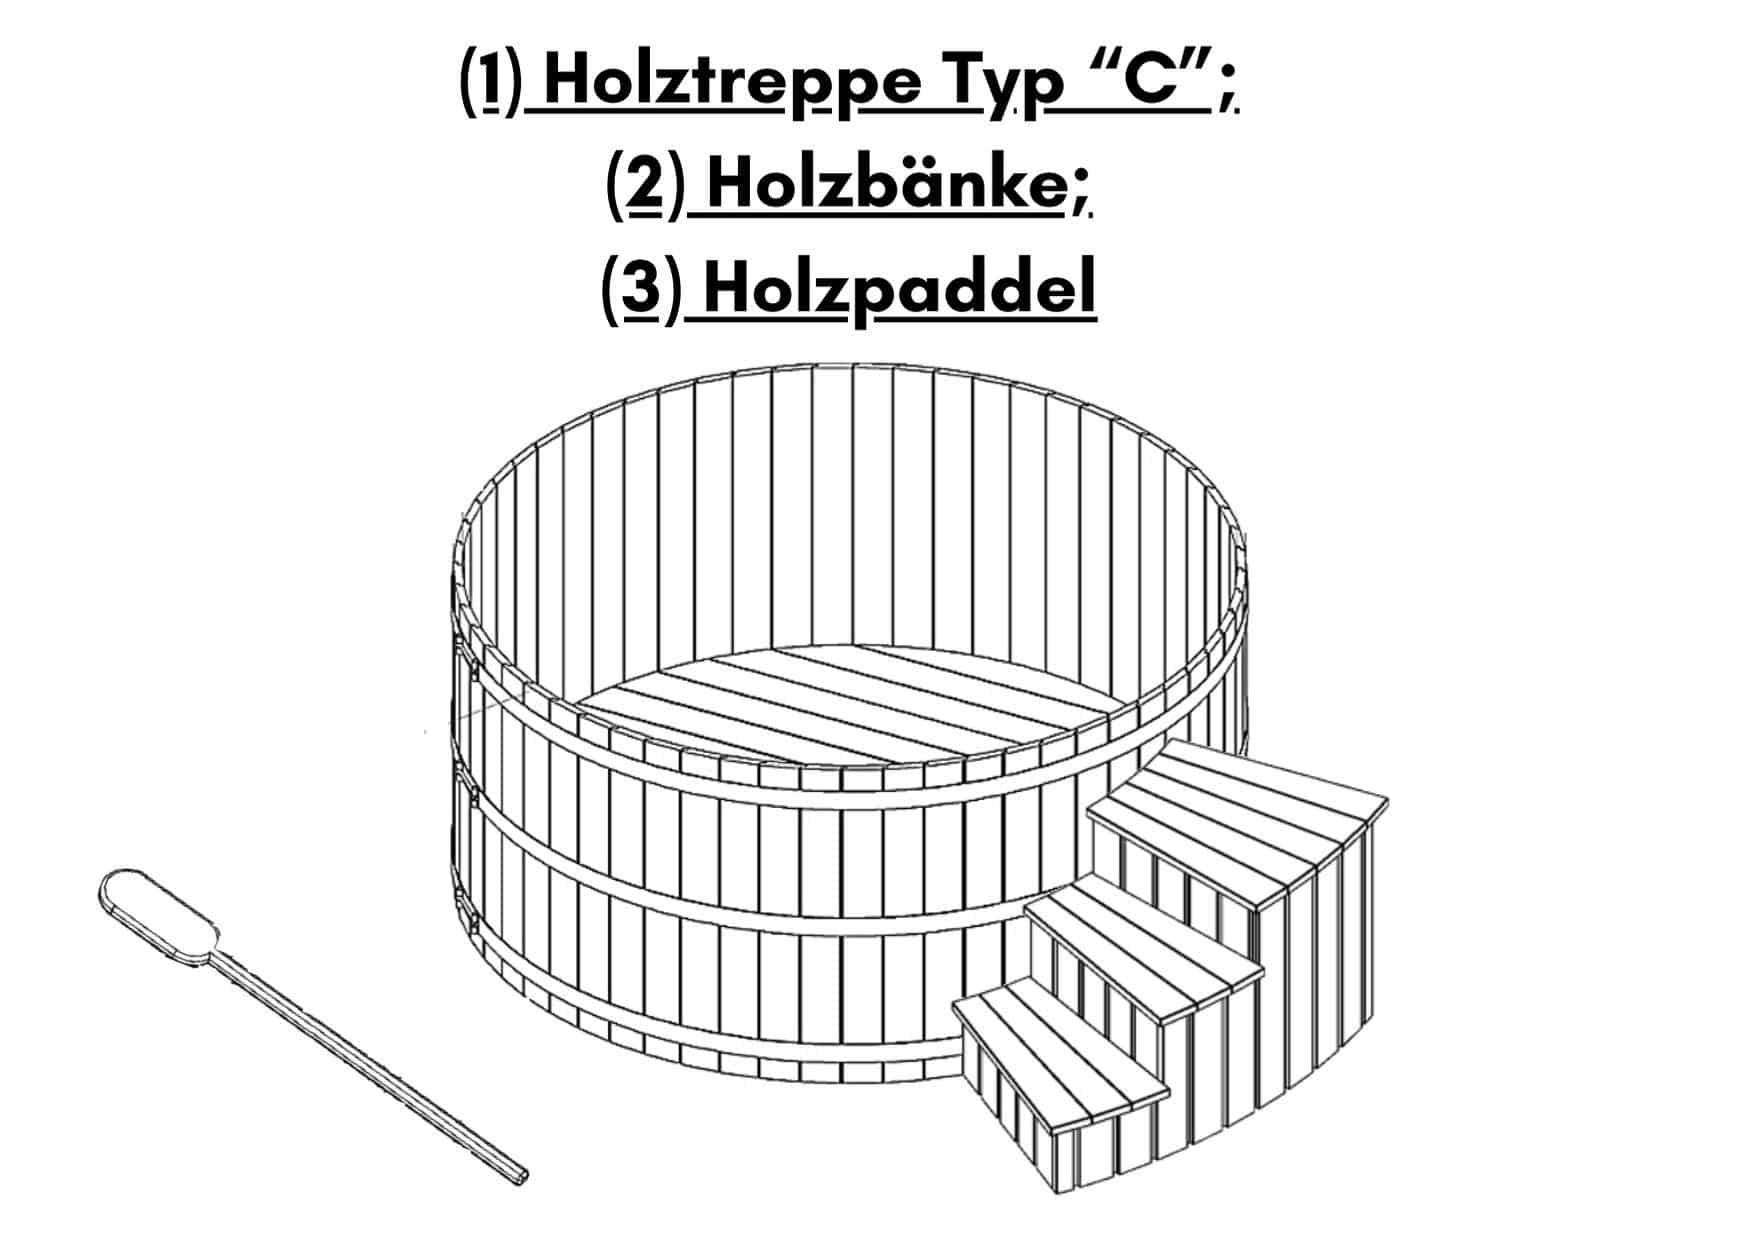 1 Holztreppe Typ C 2 Holzbaenke 3 Holzpaddel